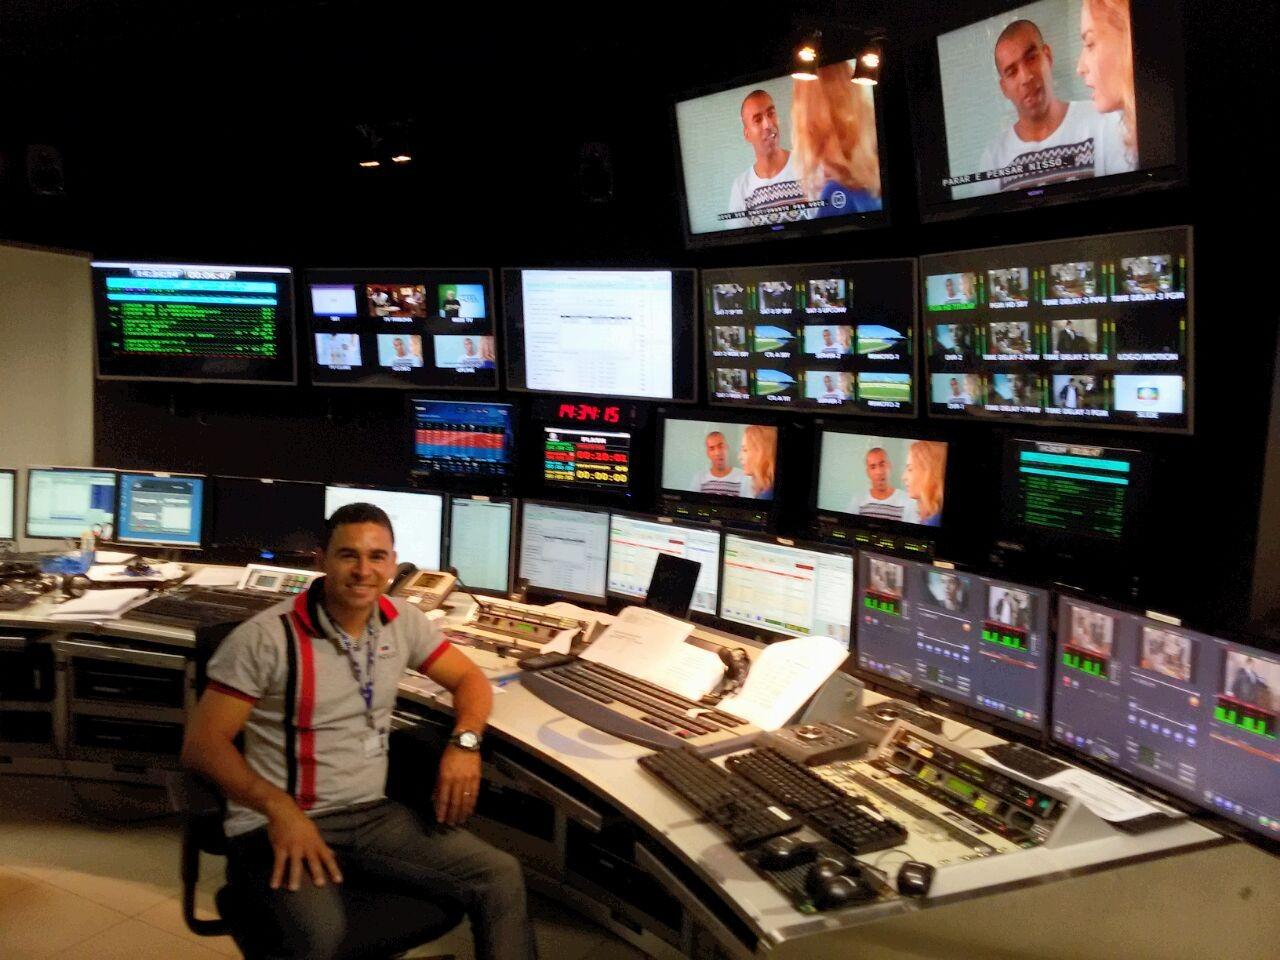 Operador de controle mestre da TV Asa Branca em treinamento na Globo Nordeste (Foto: Azenilson Vieira / TV Asa Branca)